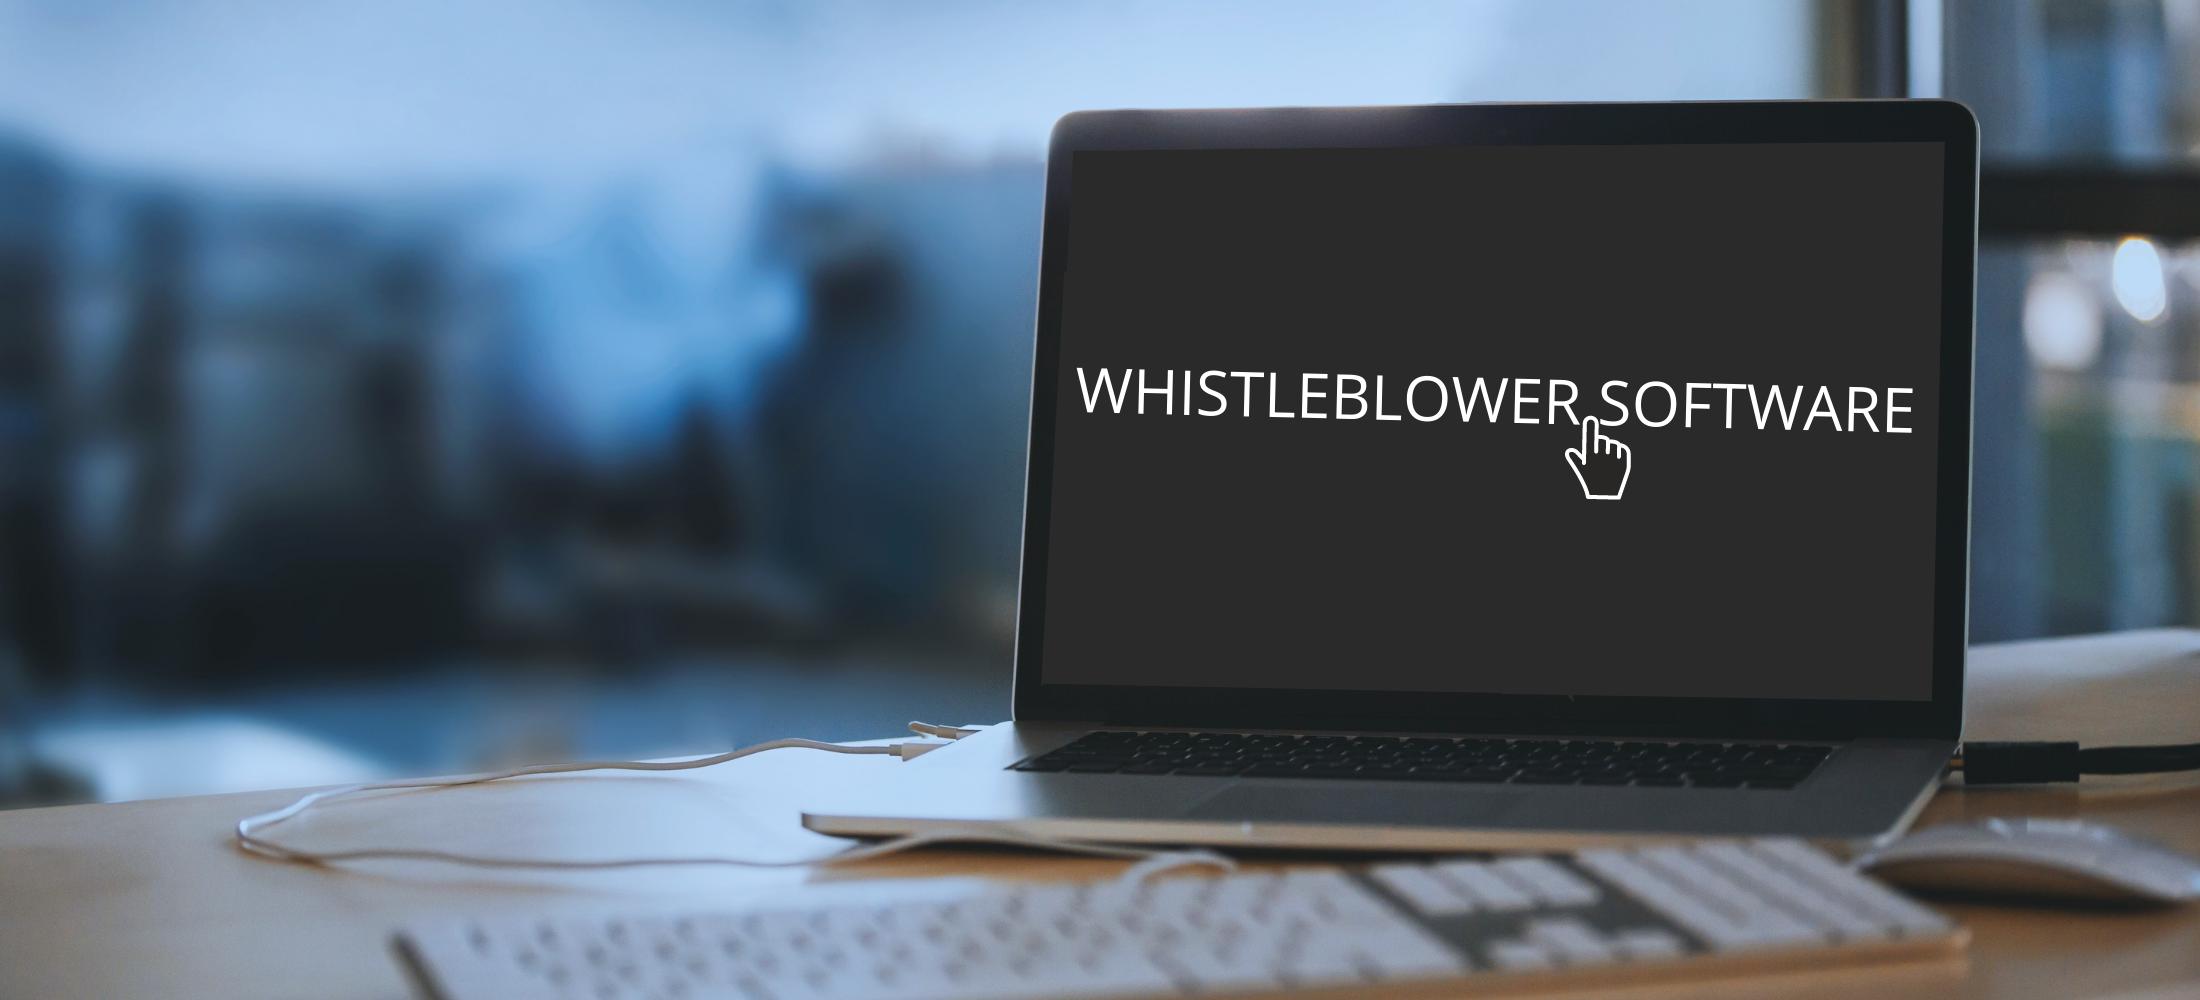 Whistleblower programme